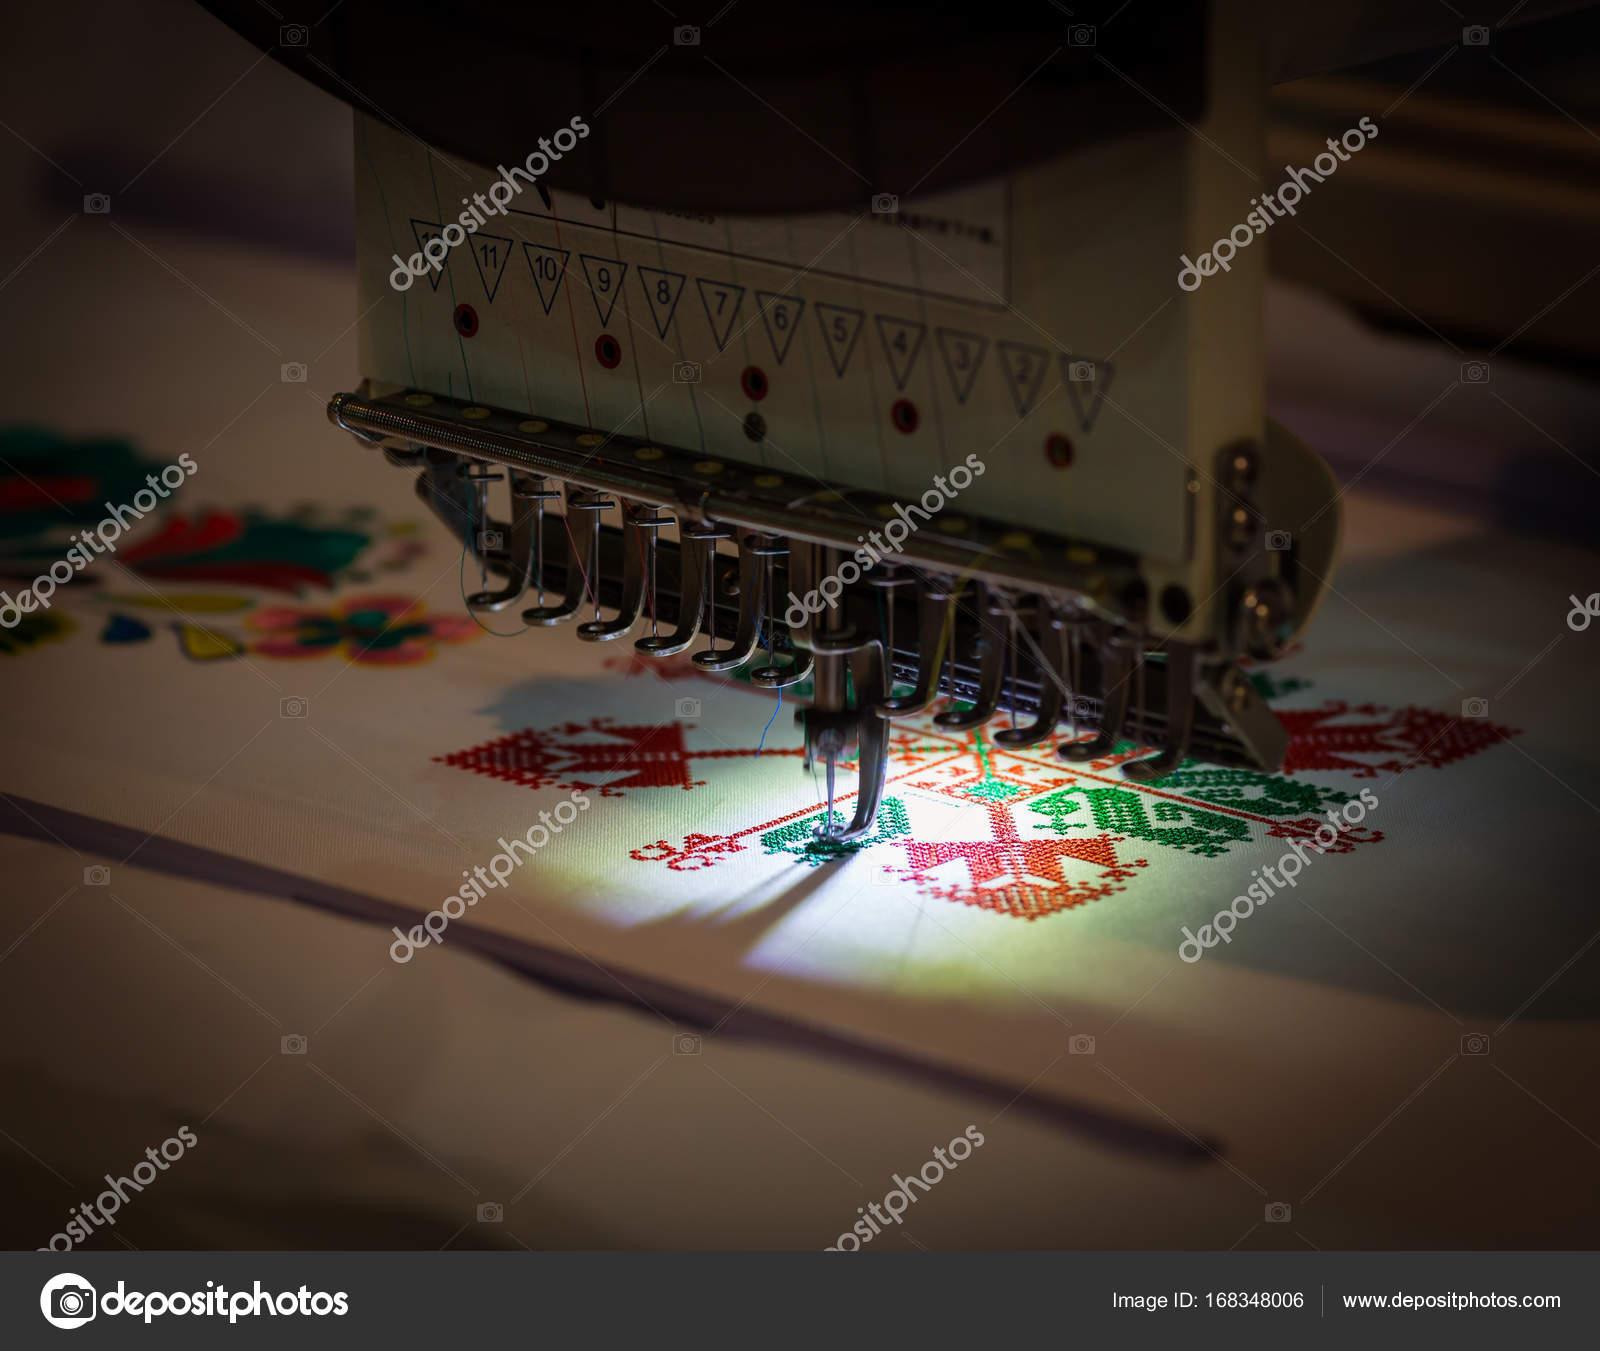 die Stickmuster Nähmaschine — Stockfoto © Nomadsoul1 #168348006